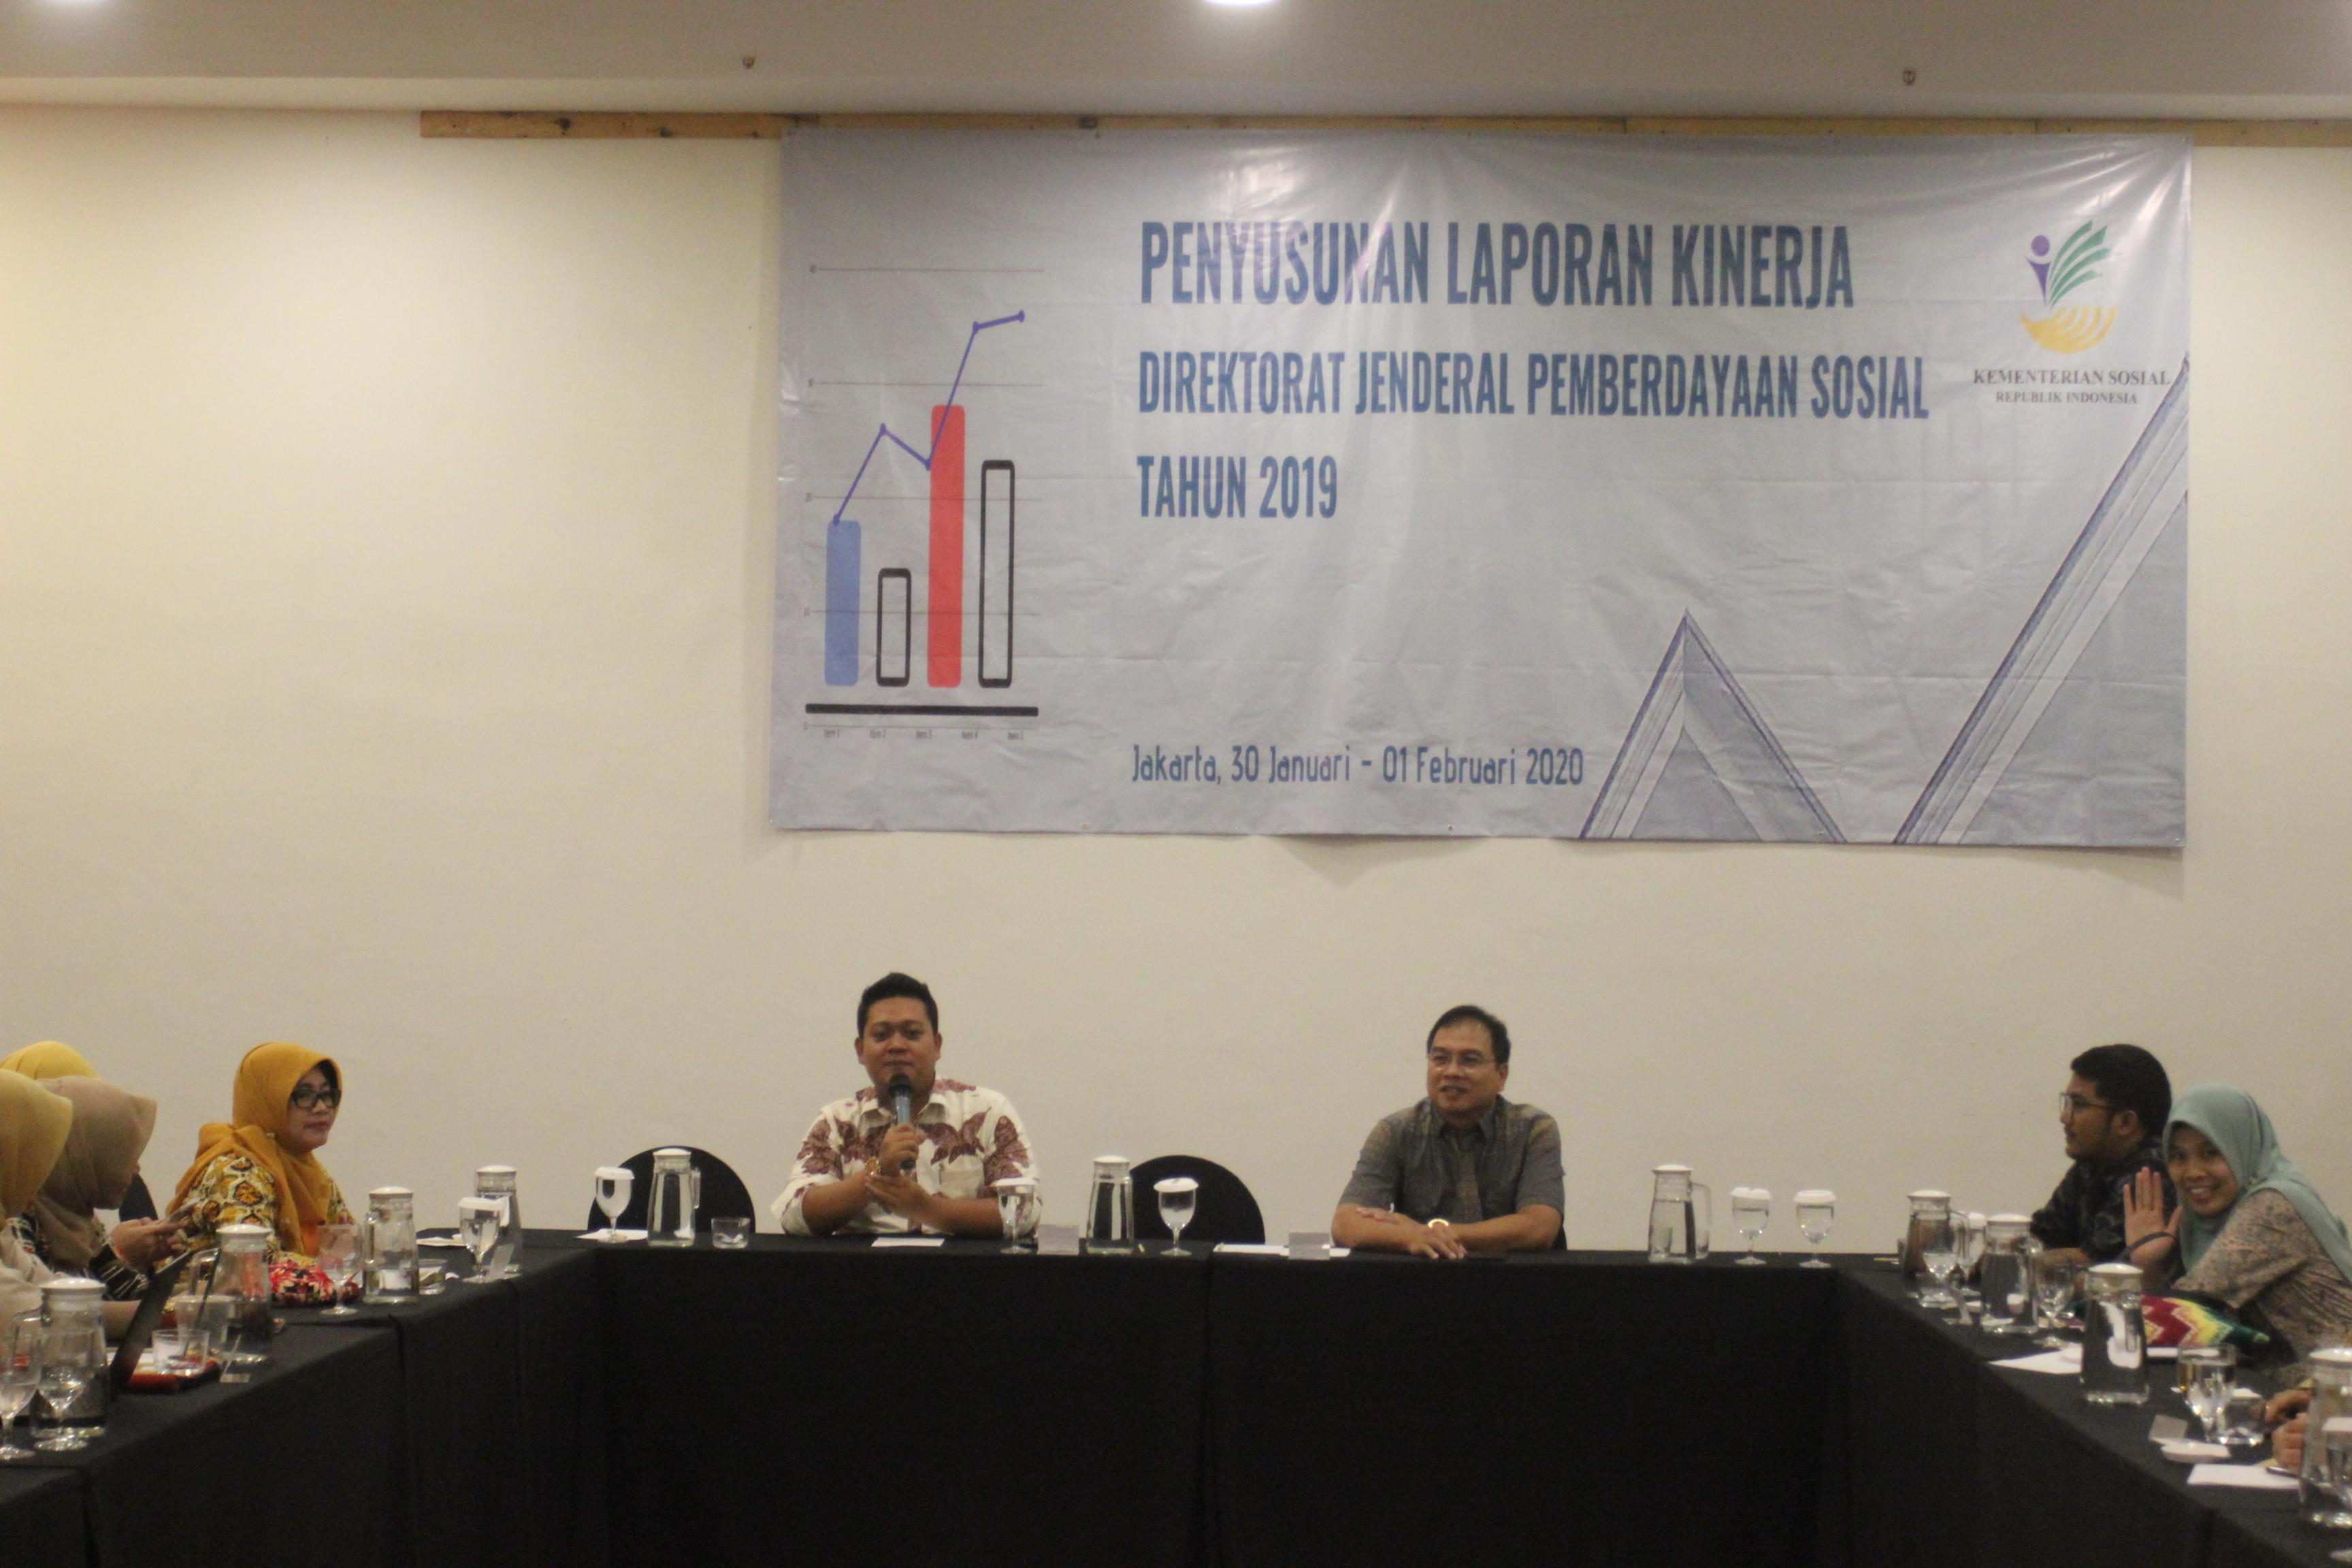 Rapat Penyusunan Laporan Kinerja Direktorat Jenderal Pemberdayaan Sosial